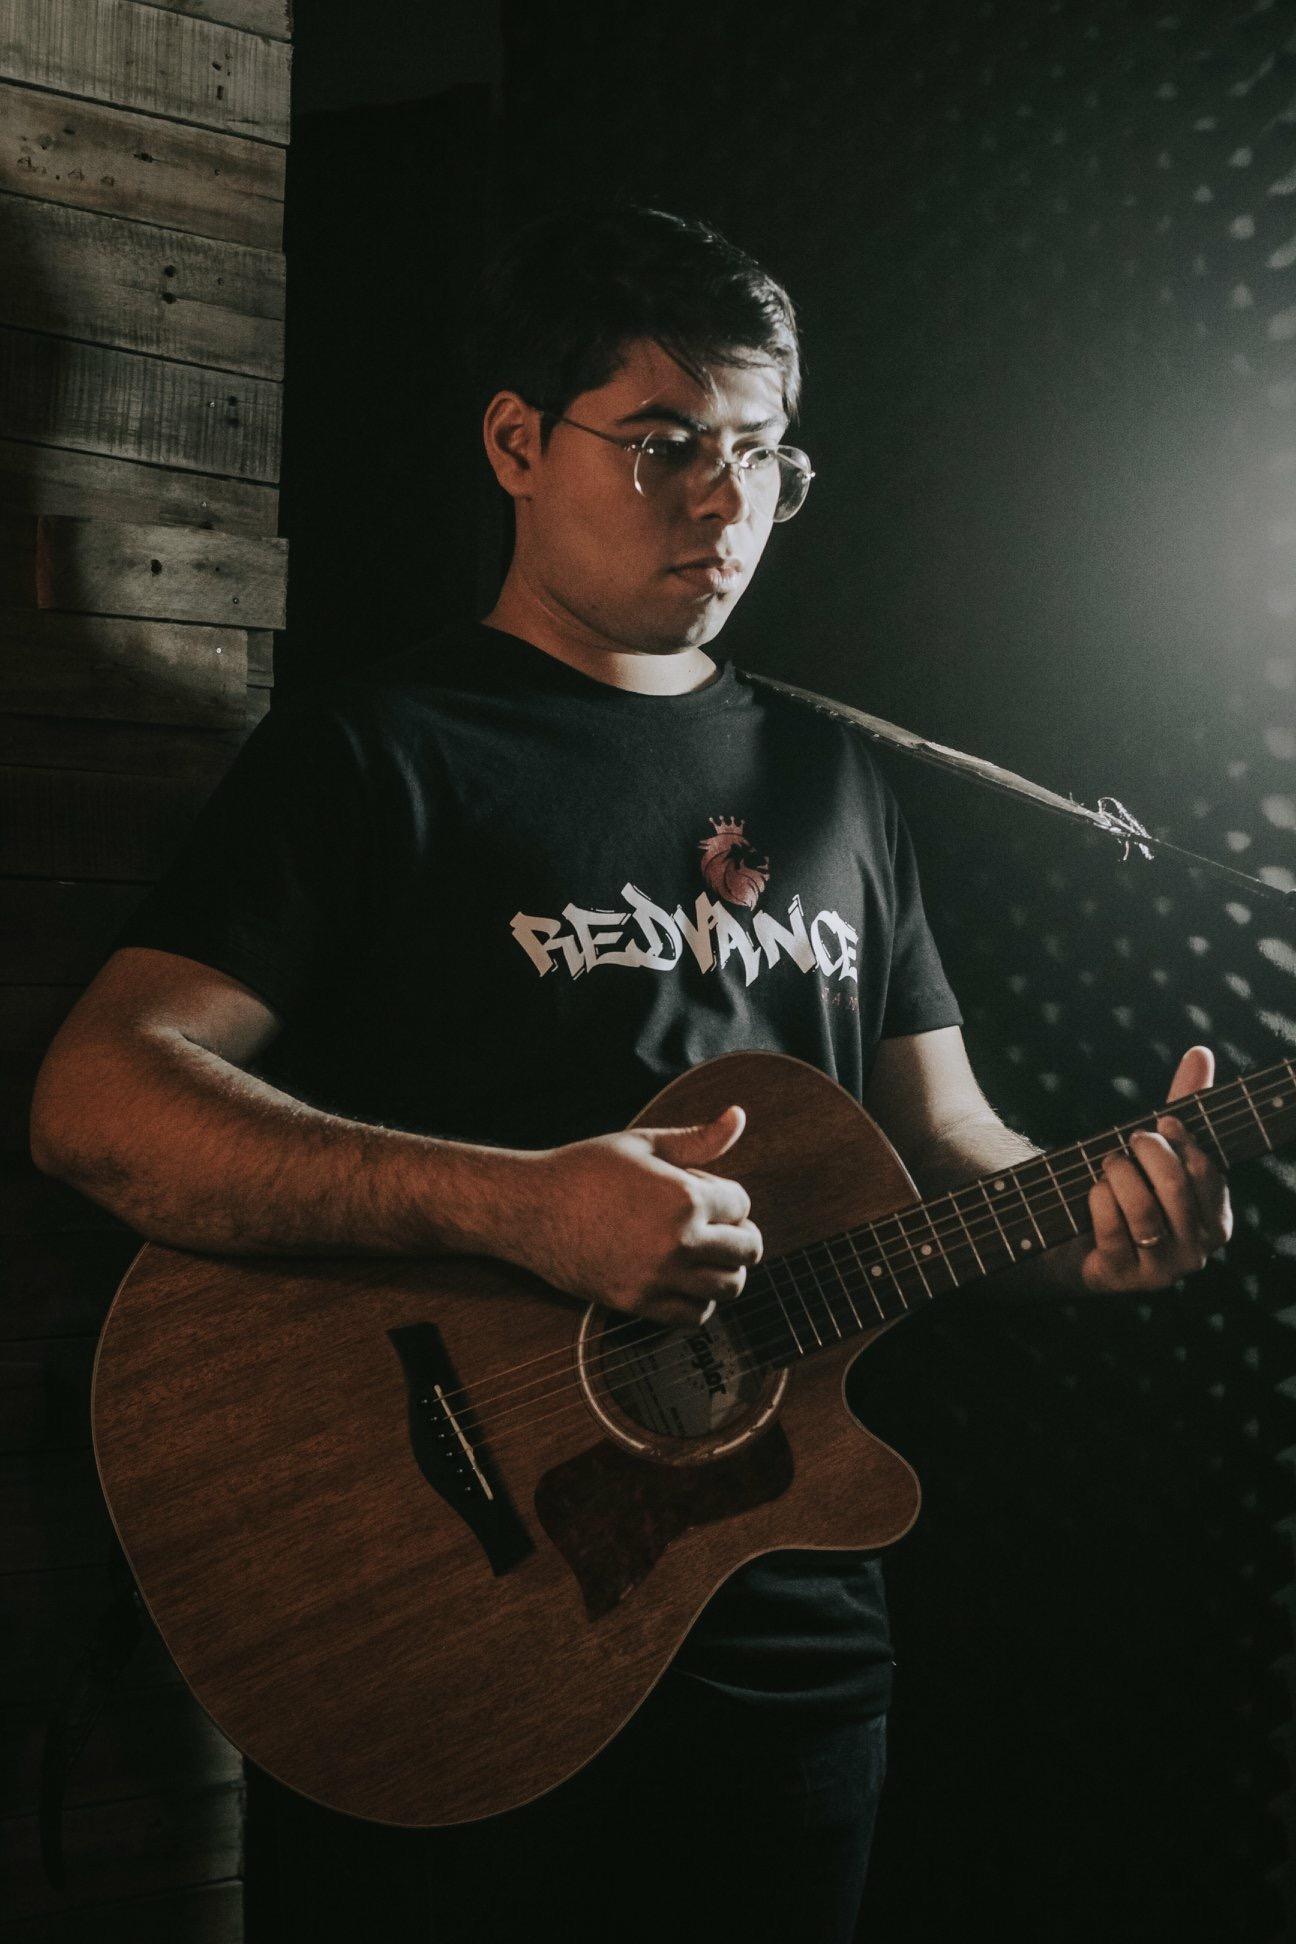 Junior Rocha